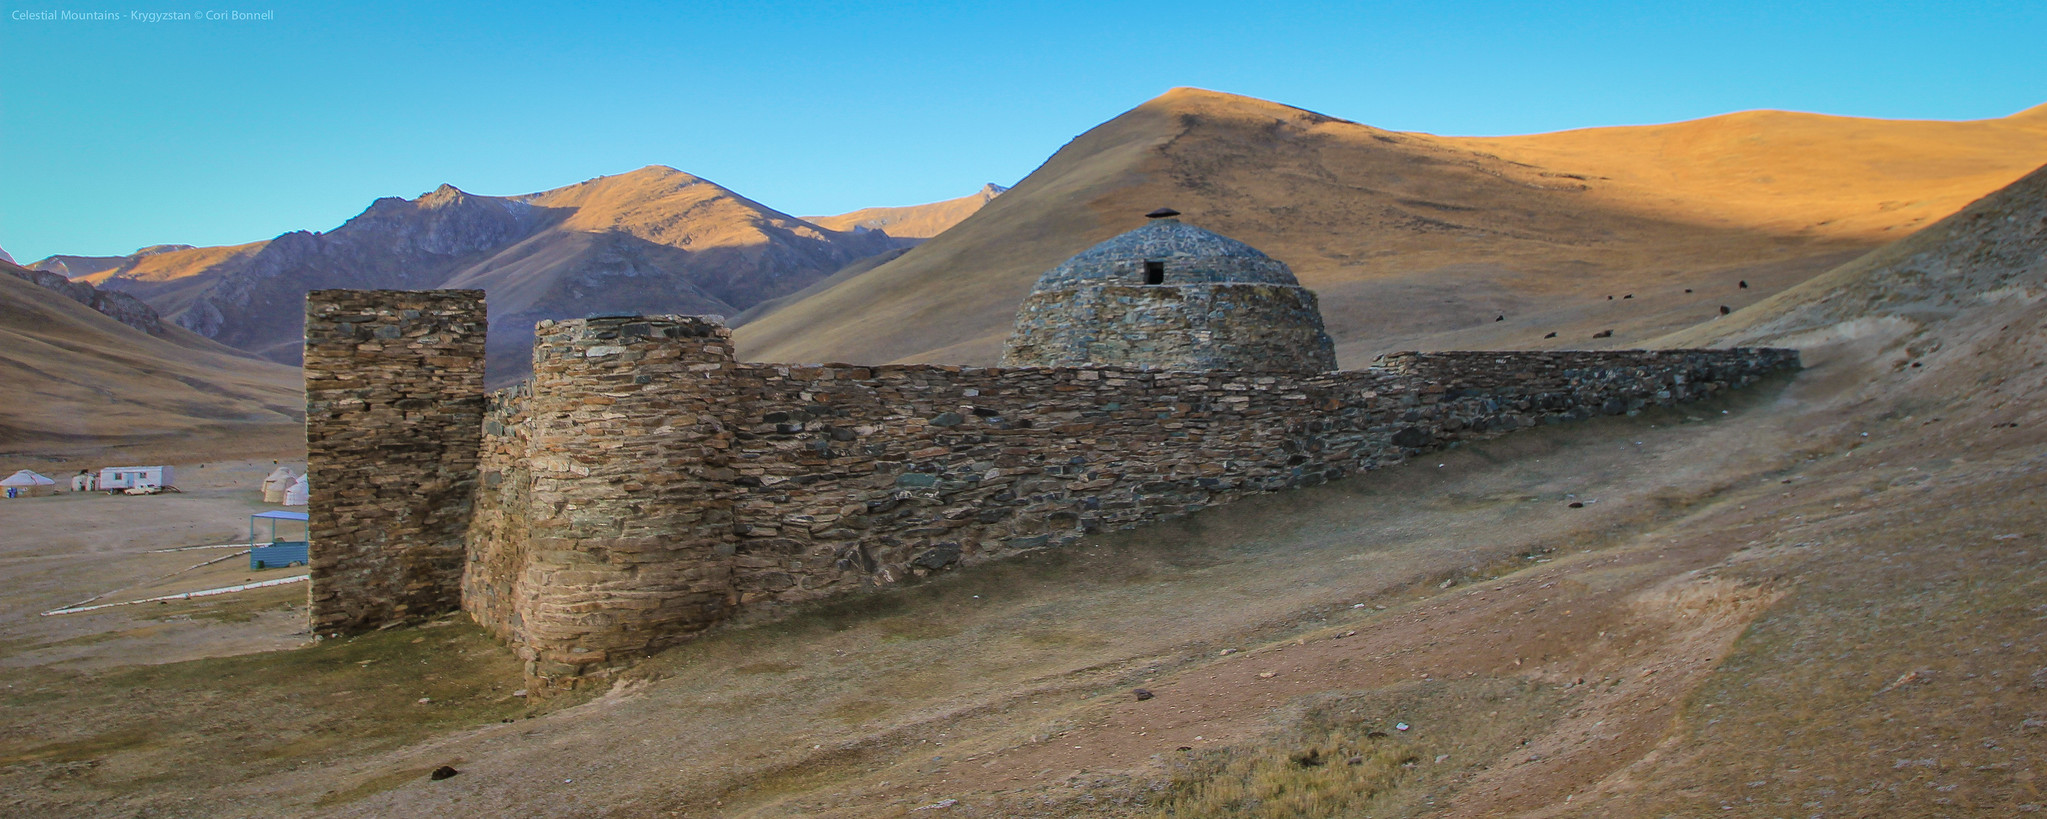 Silk Road  Tash Rabat Caravanserai in Kyrgyzstan